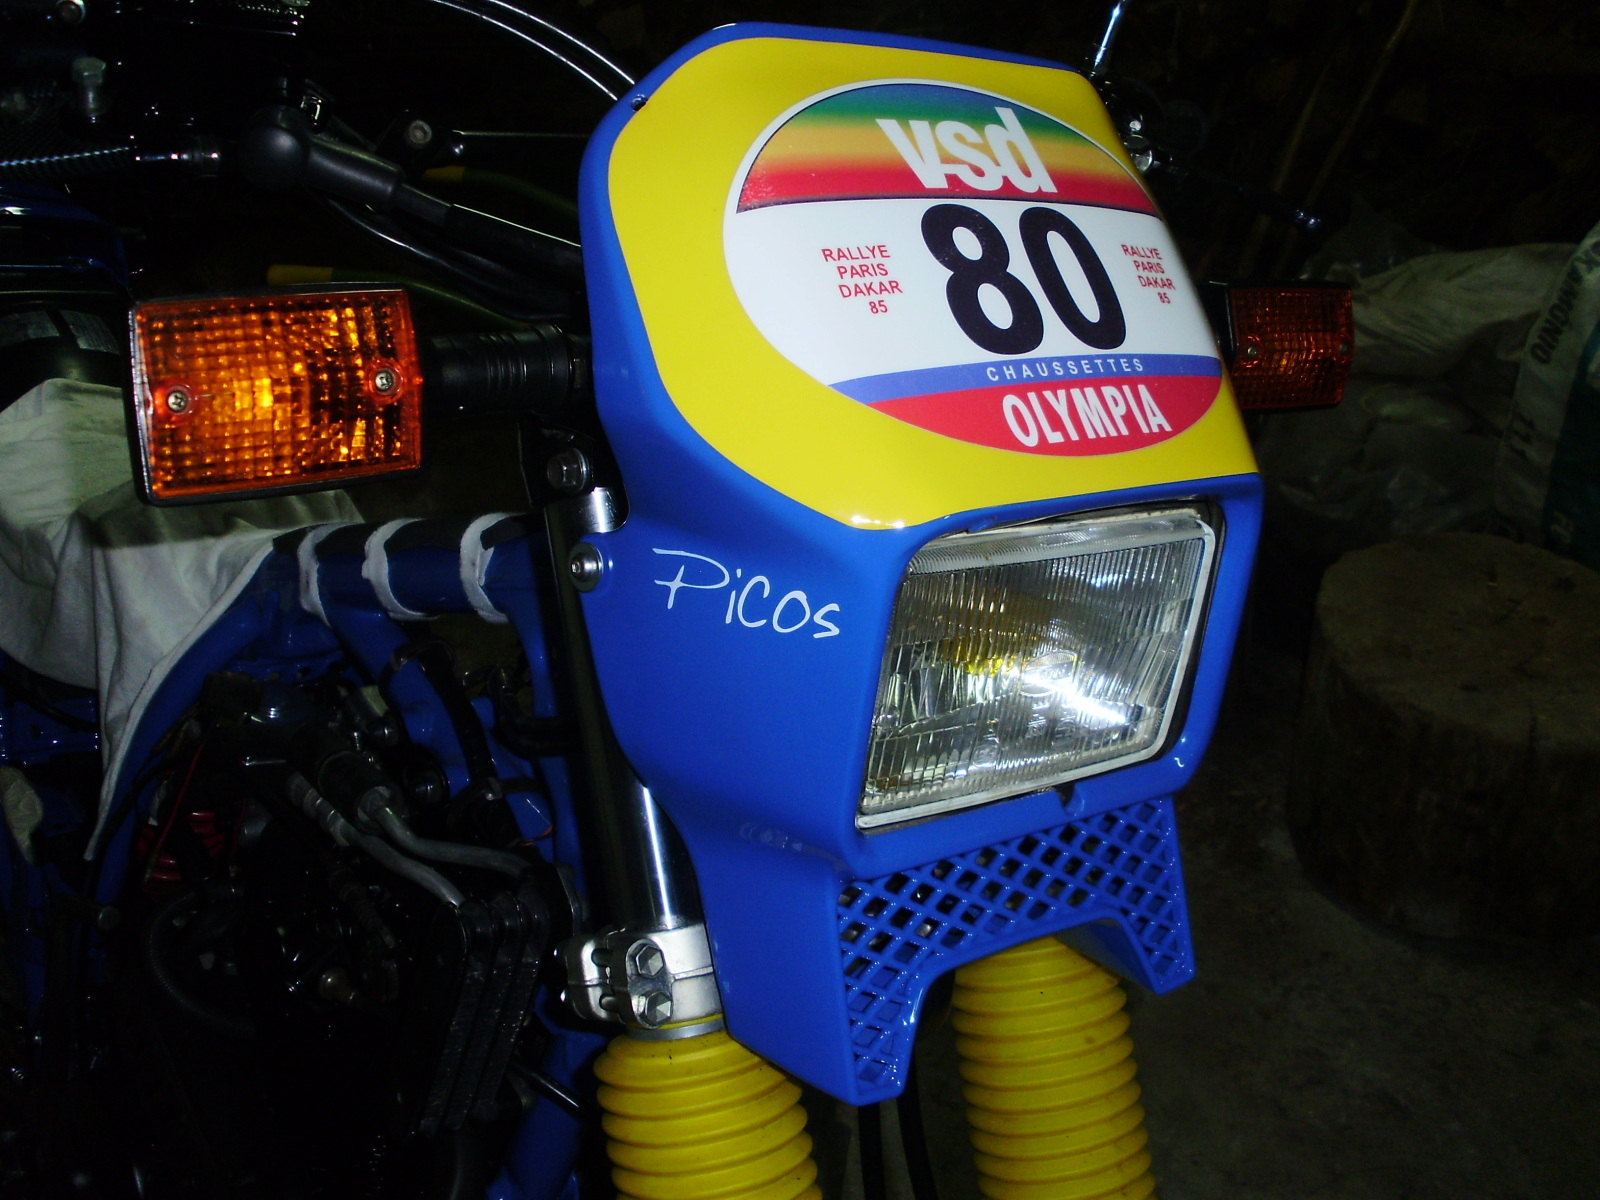 Yamaha xt600z Tenere replica dakar 1985 ( Jean Claude Olivier ) - Página 4 6s74vt